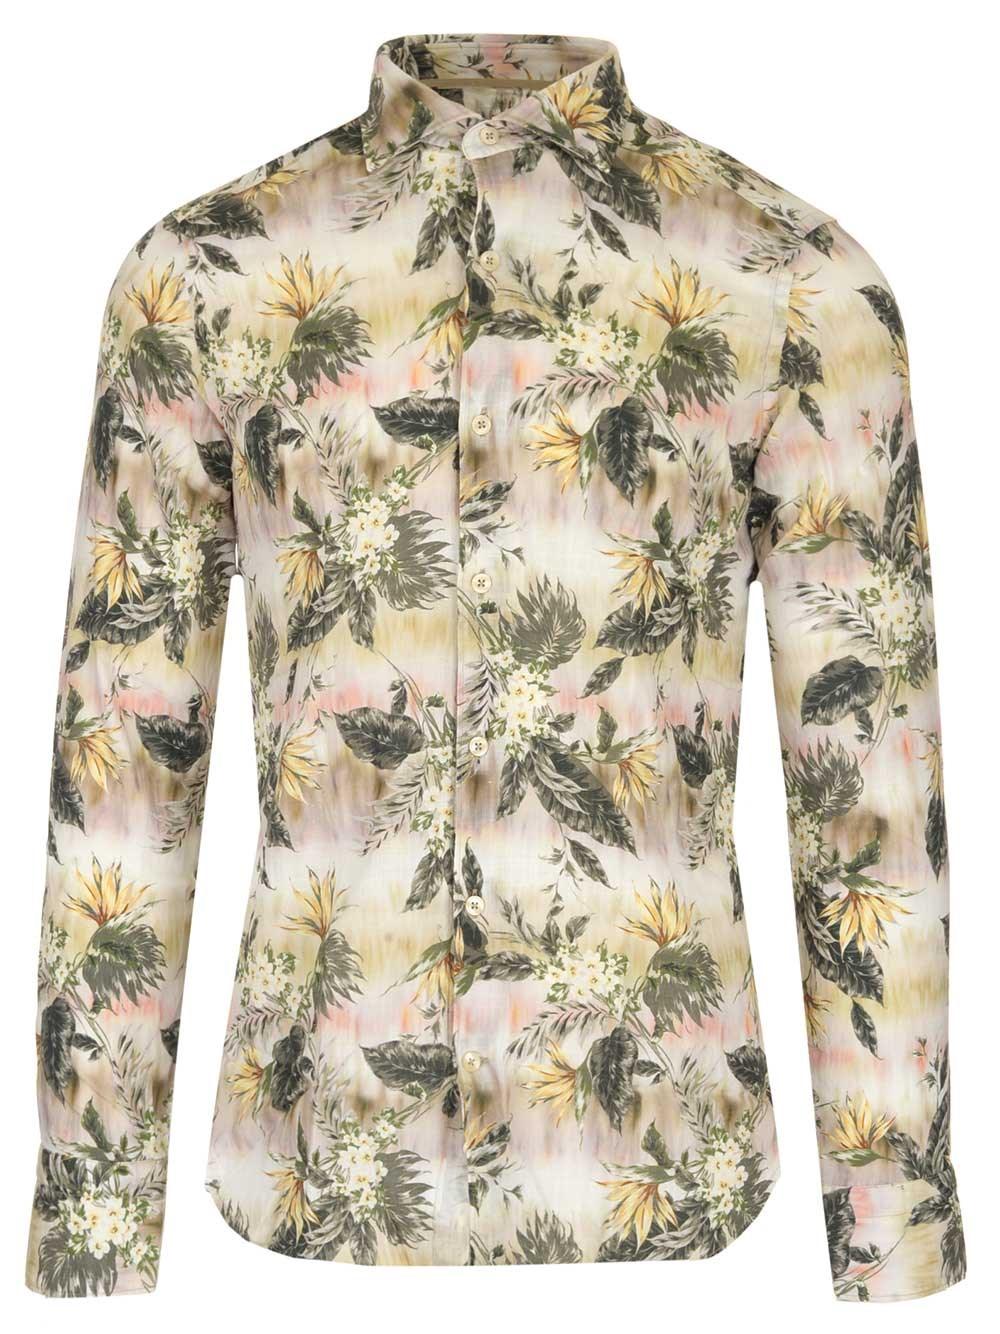 AL DUCA D'AOSTA 1902 Cotton Popelin Slim Fit Shirt